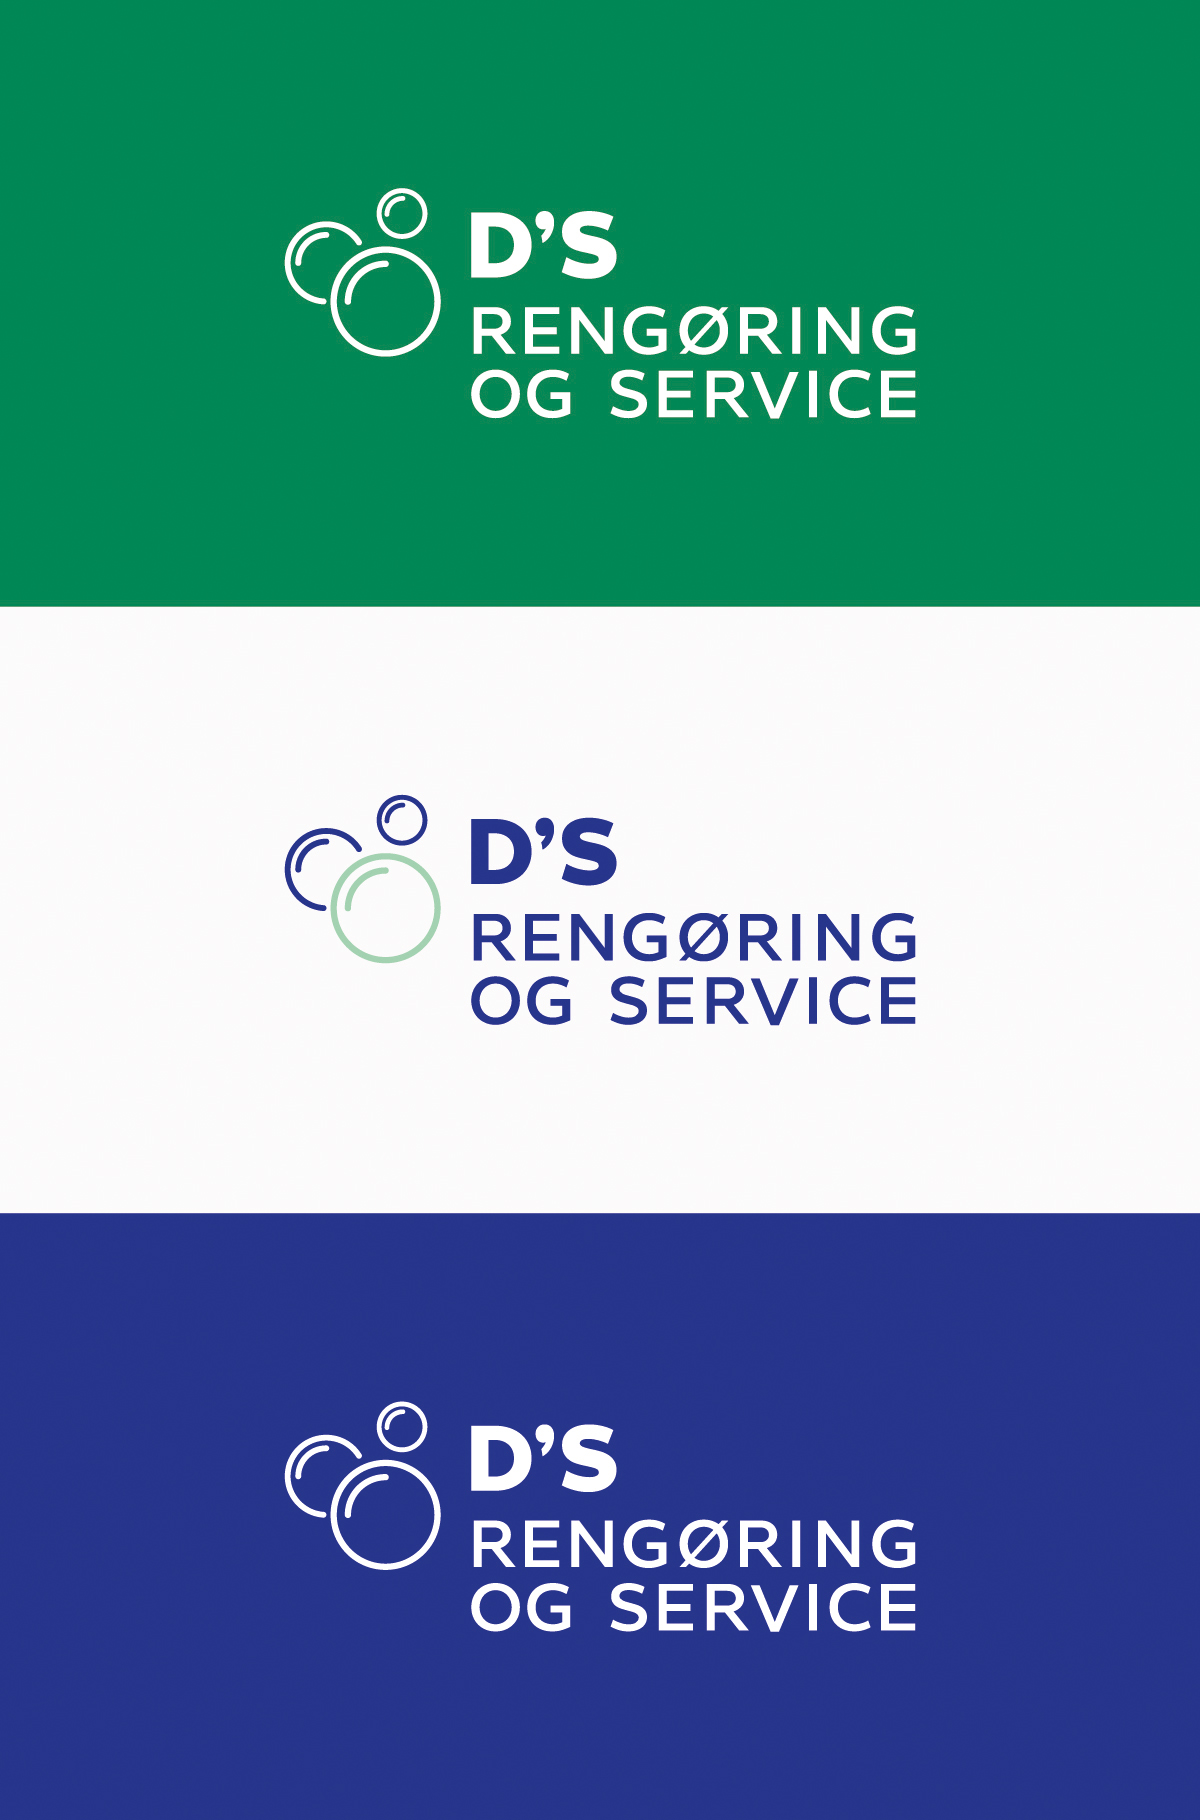 D'S Rengøring og Service Logoer